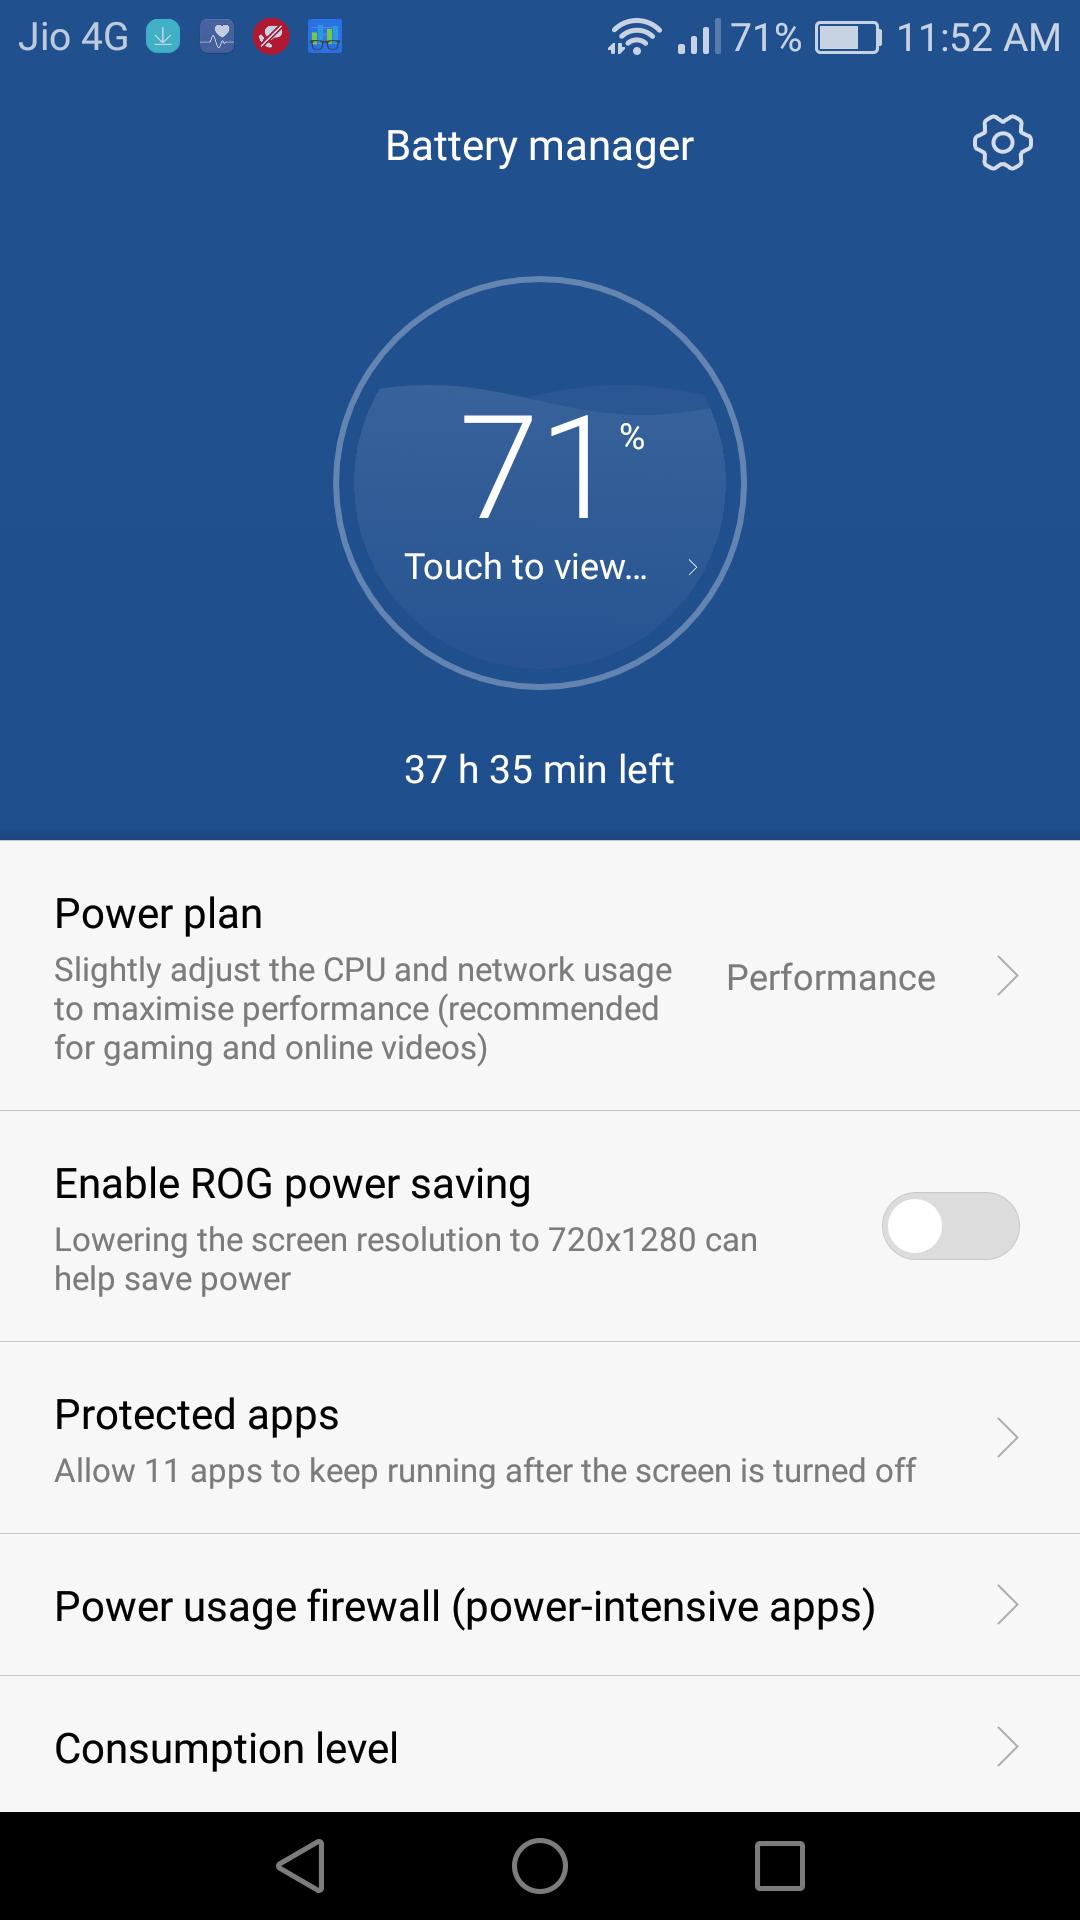 huawei-p9-battery-modes-techniblogic